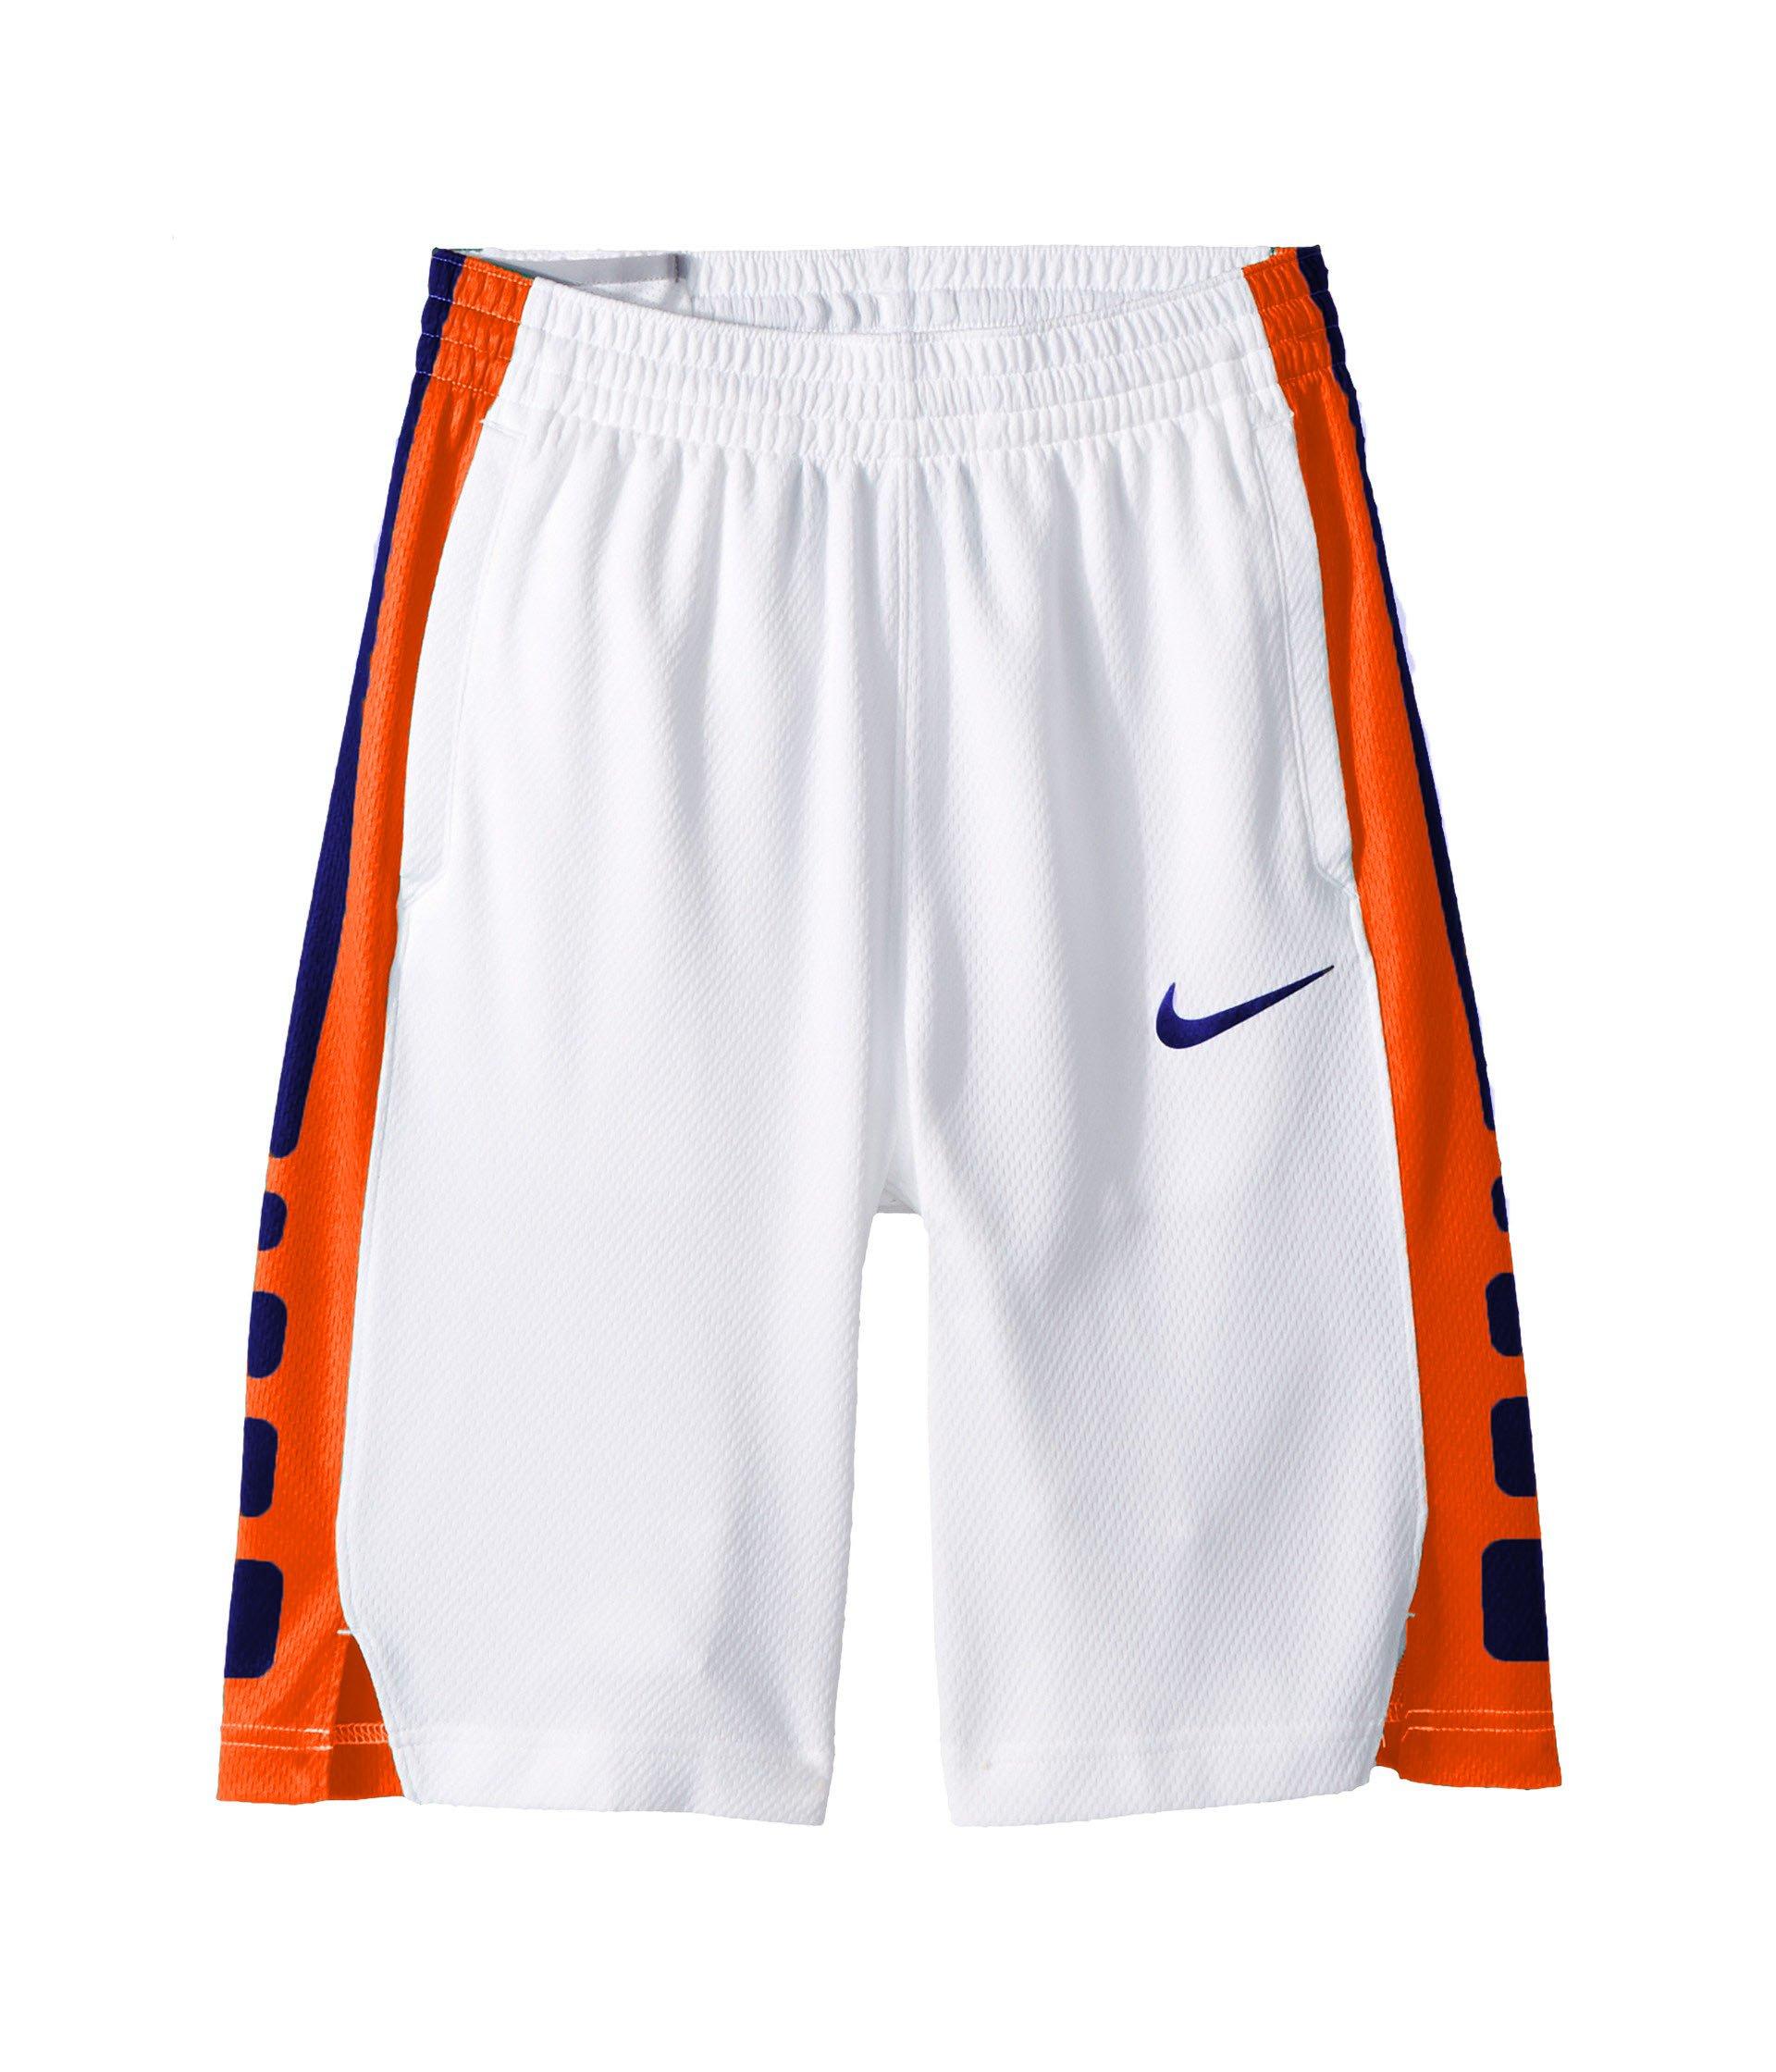 Nike Big Kids' (Boys') Dri-FIT Training Shorts (White(850877-102)/White/Rush Blue, Small) by Nike